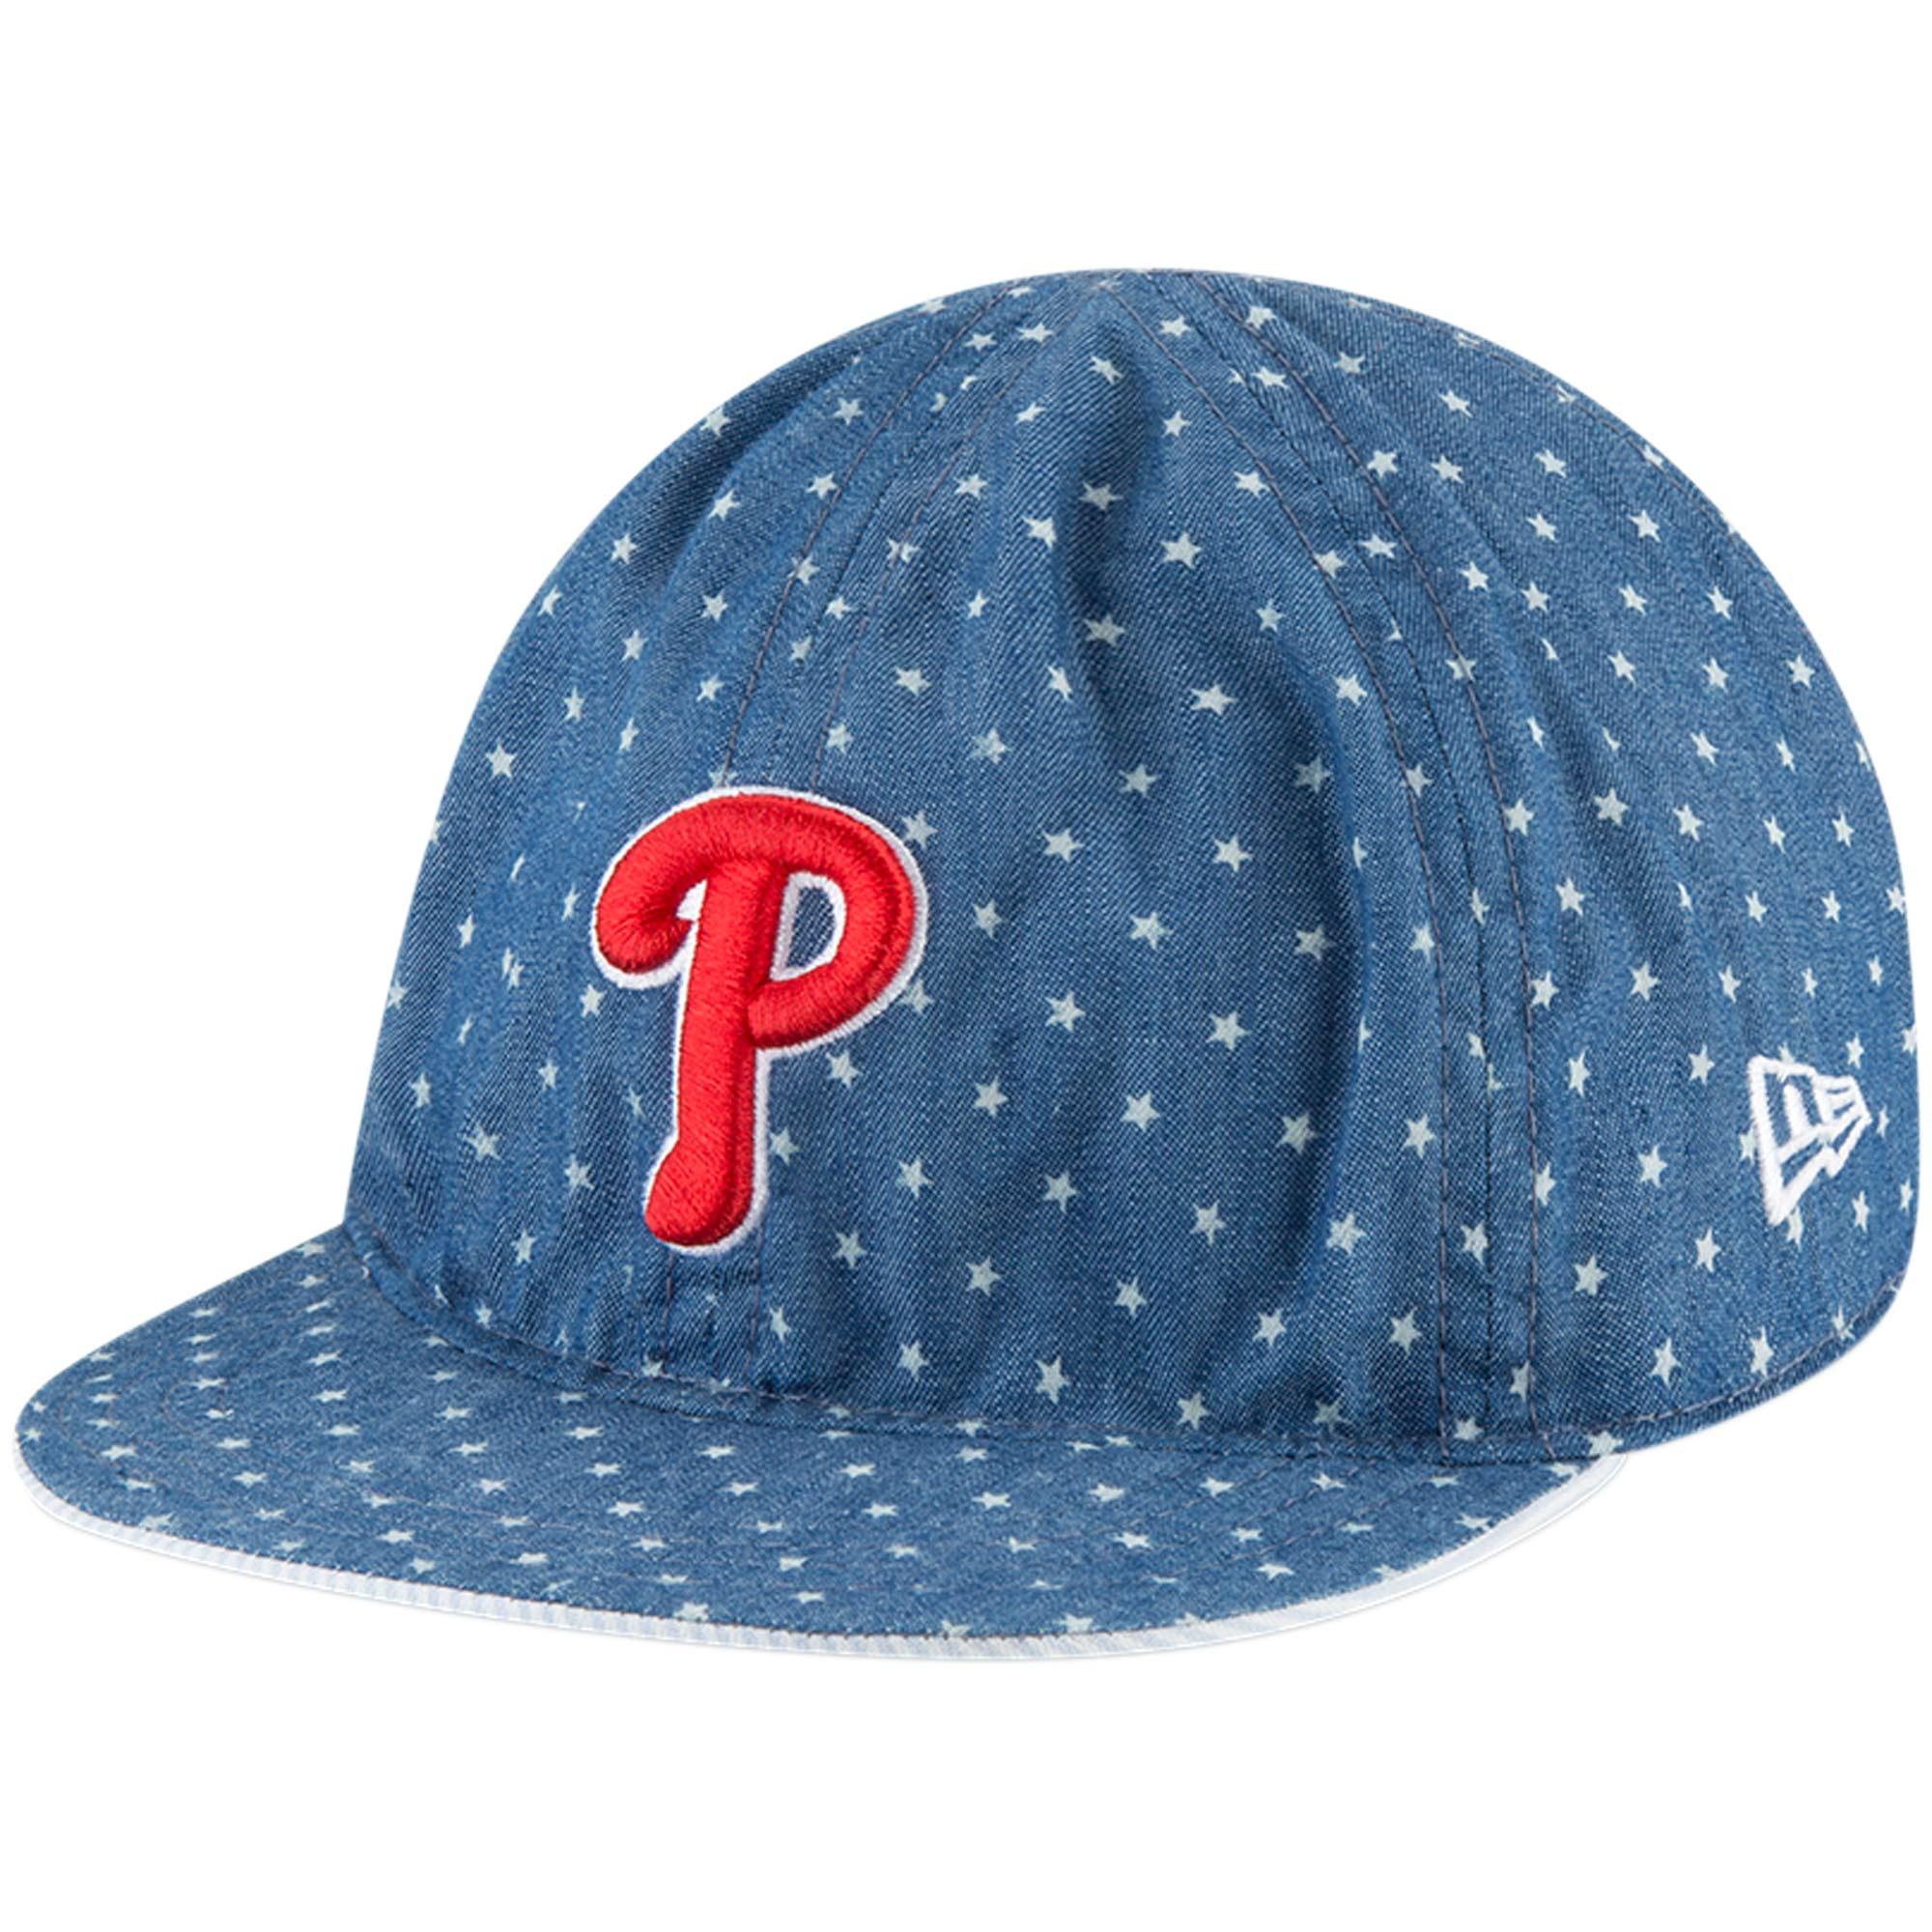 Philadelphia Phillies New Era Toddler Flip 9TWENTY Adjustable Hat - Denim - OSFA